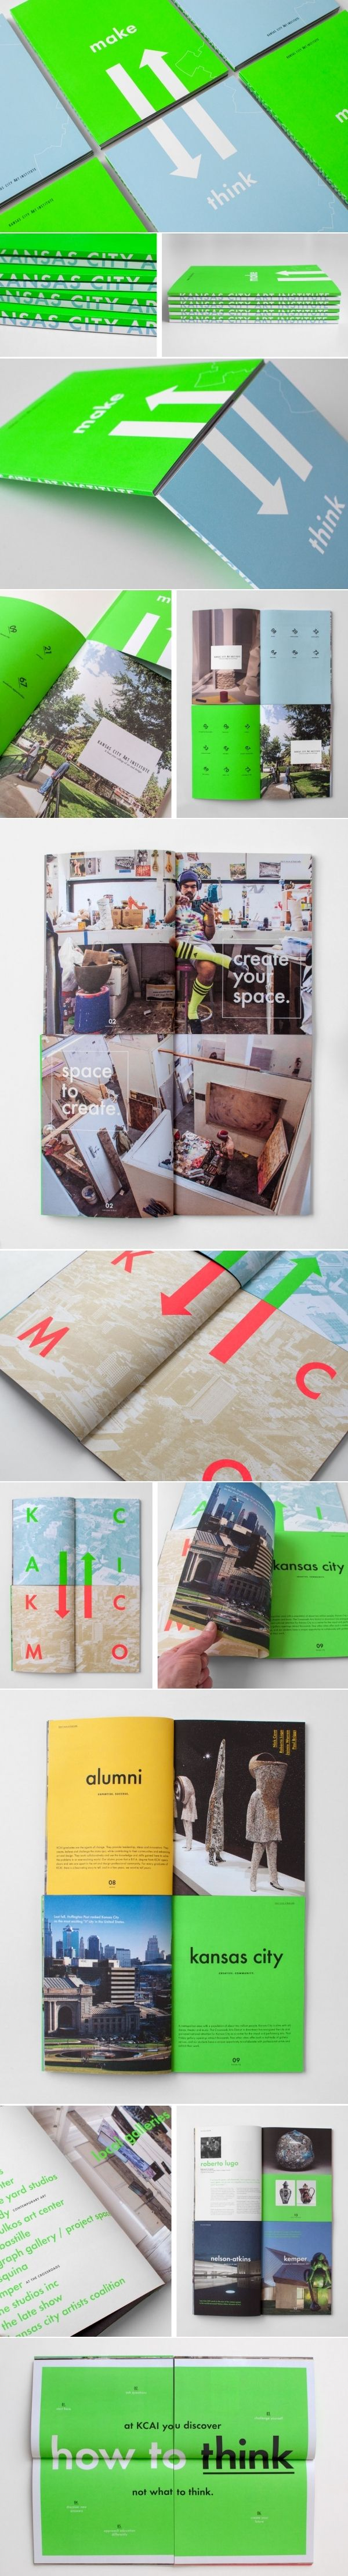 Kansas City Art Institute   Copywriting, Design, Marketing Materials   Design Ranch